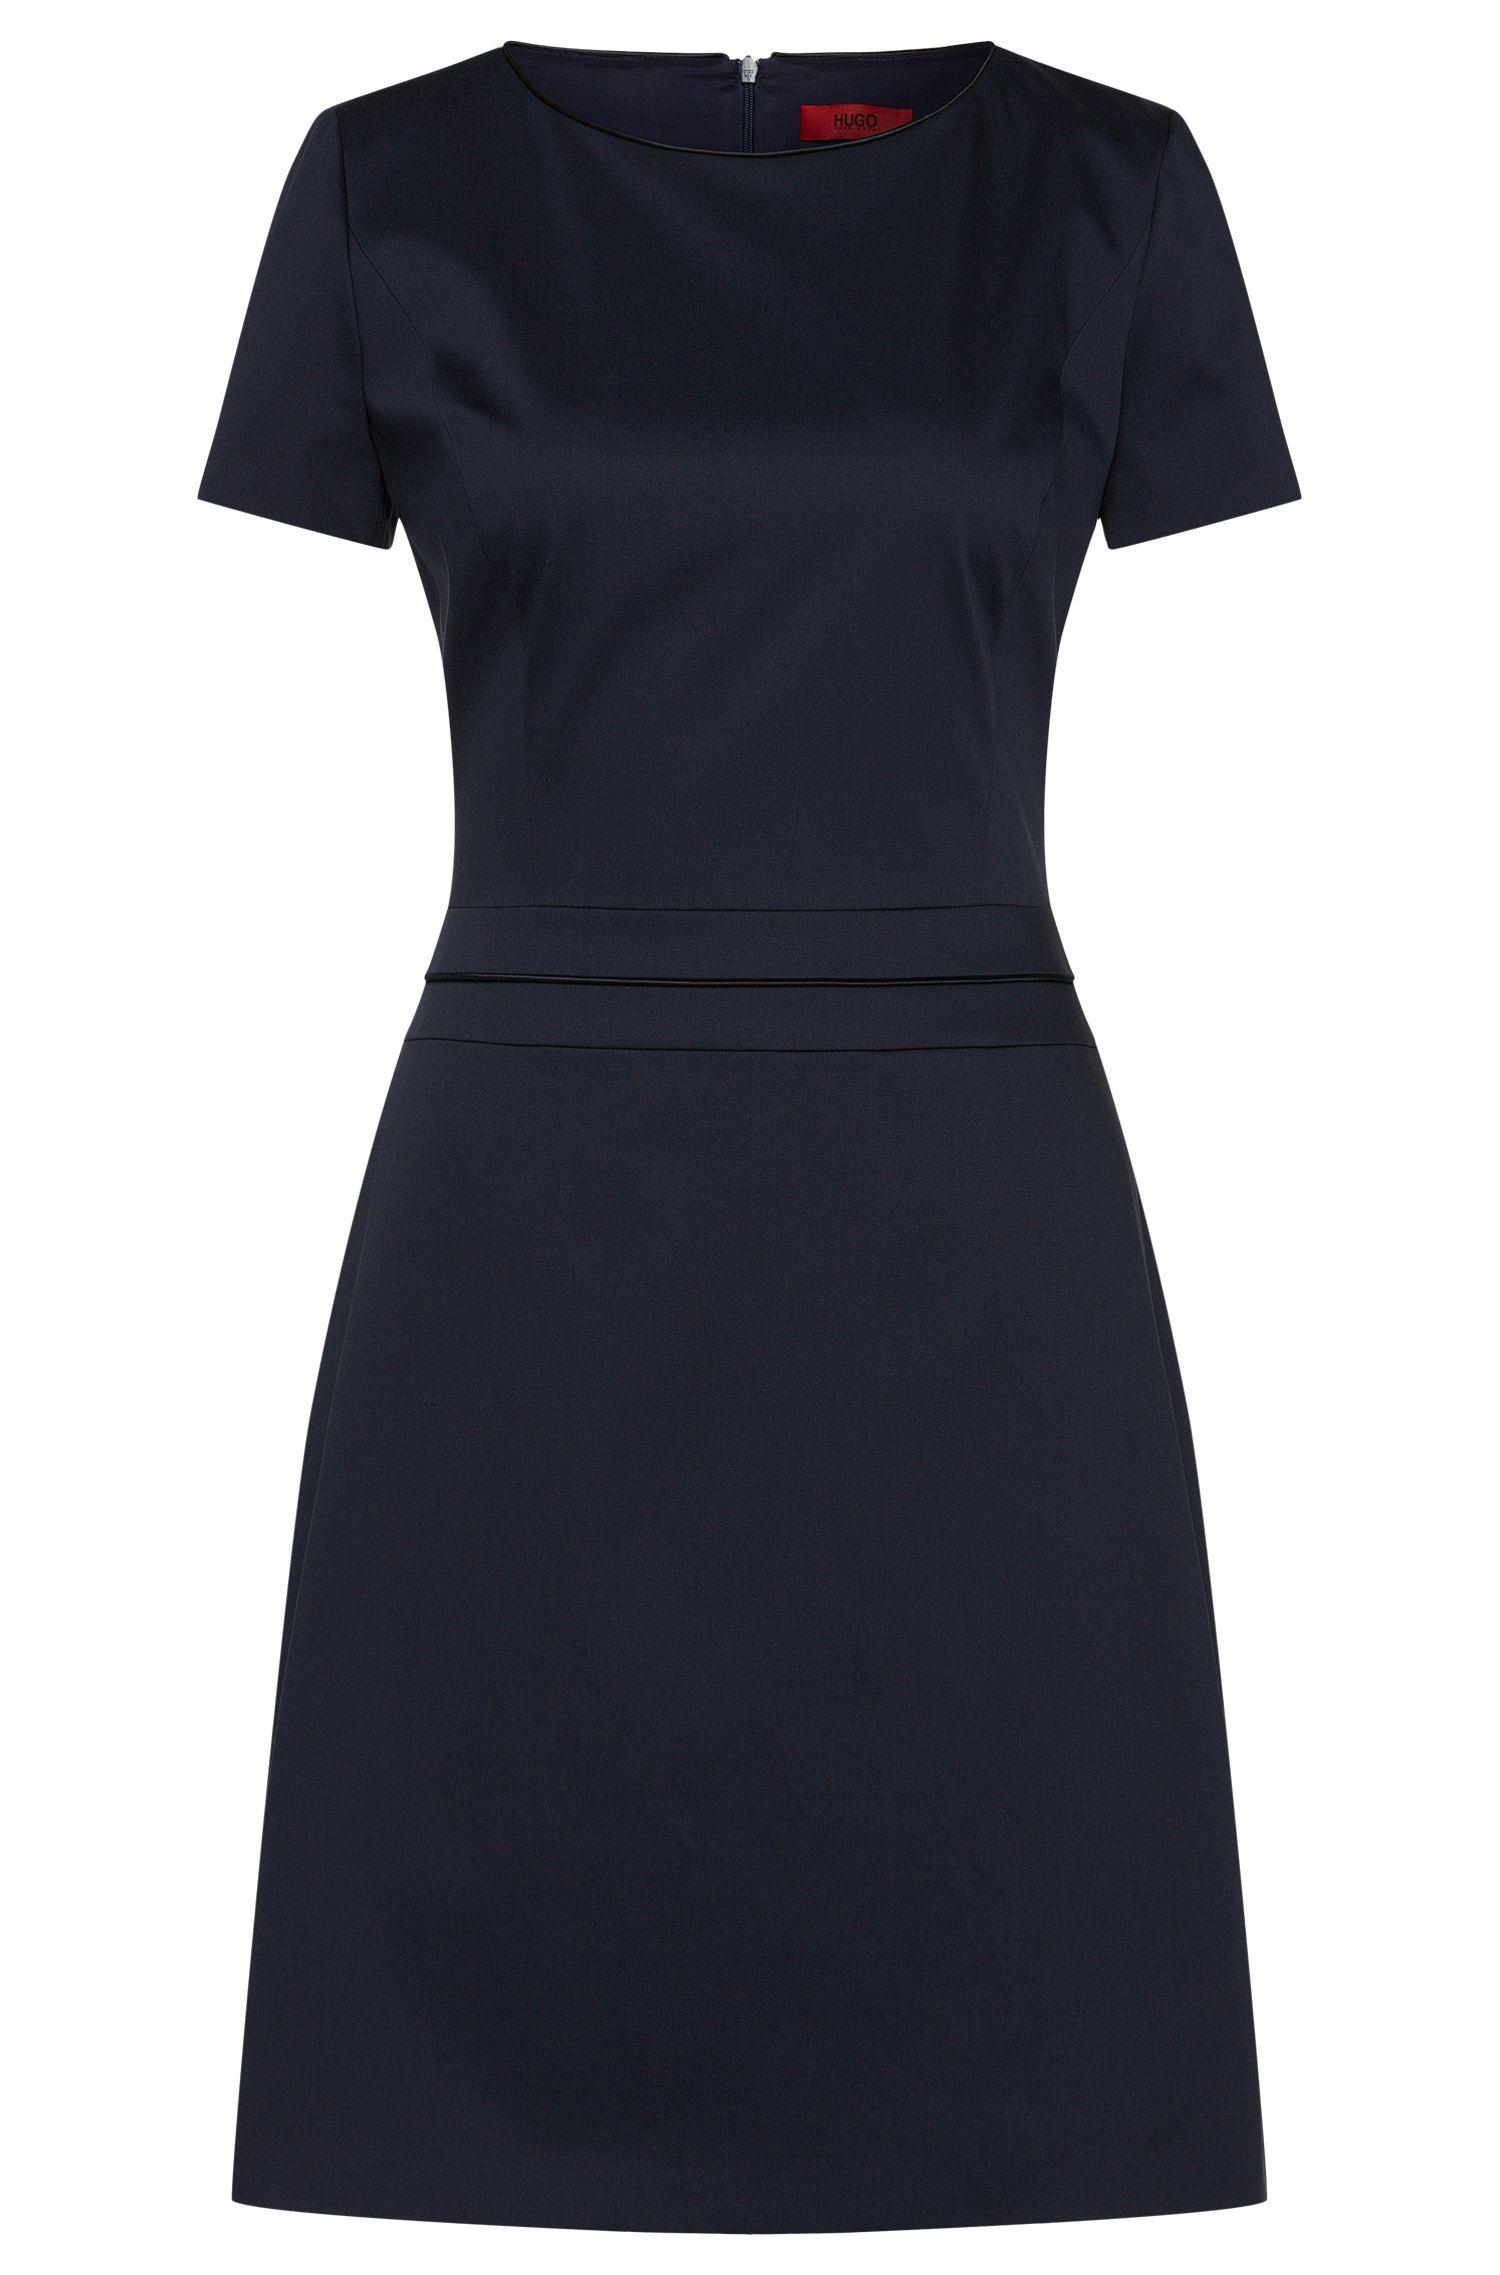 Kurzarm-Kleid aus Stretch-Baumwolle: 'Katniss'